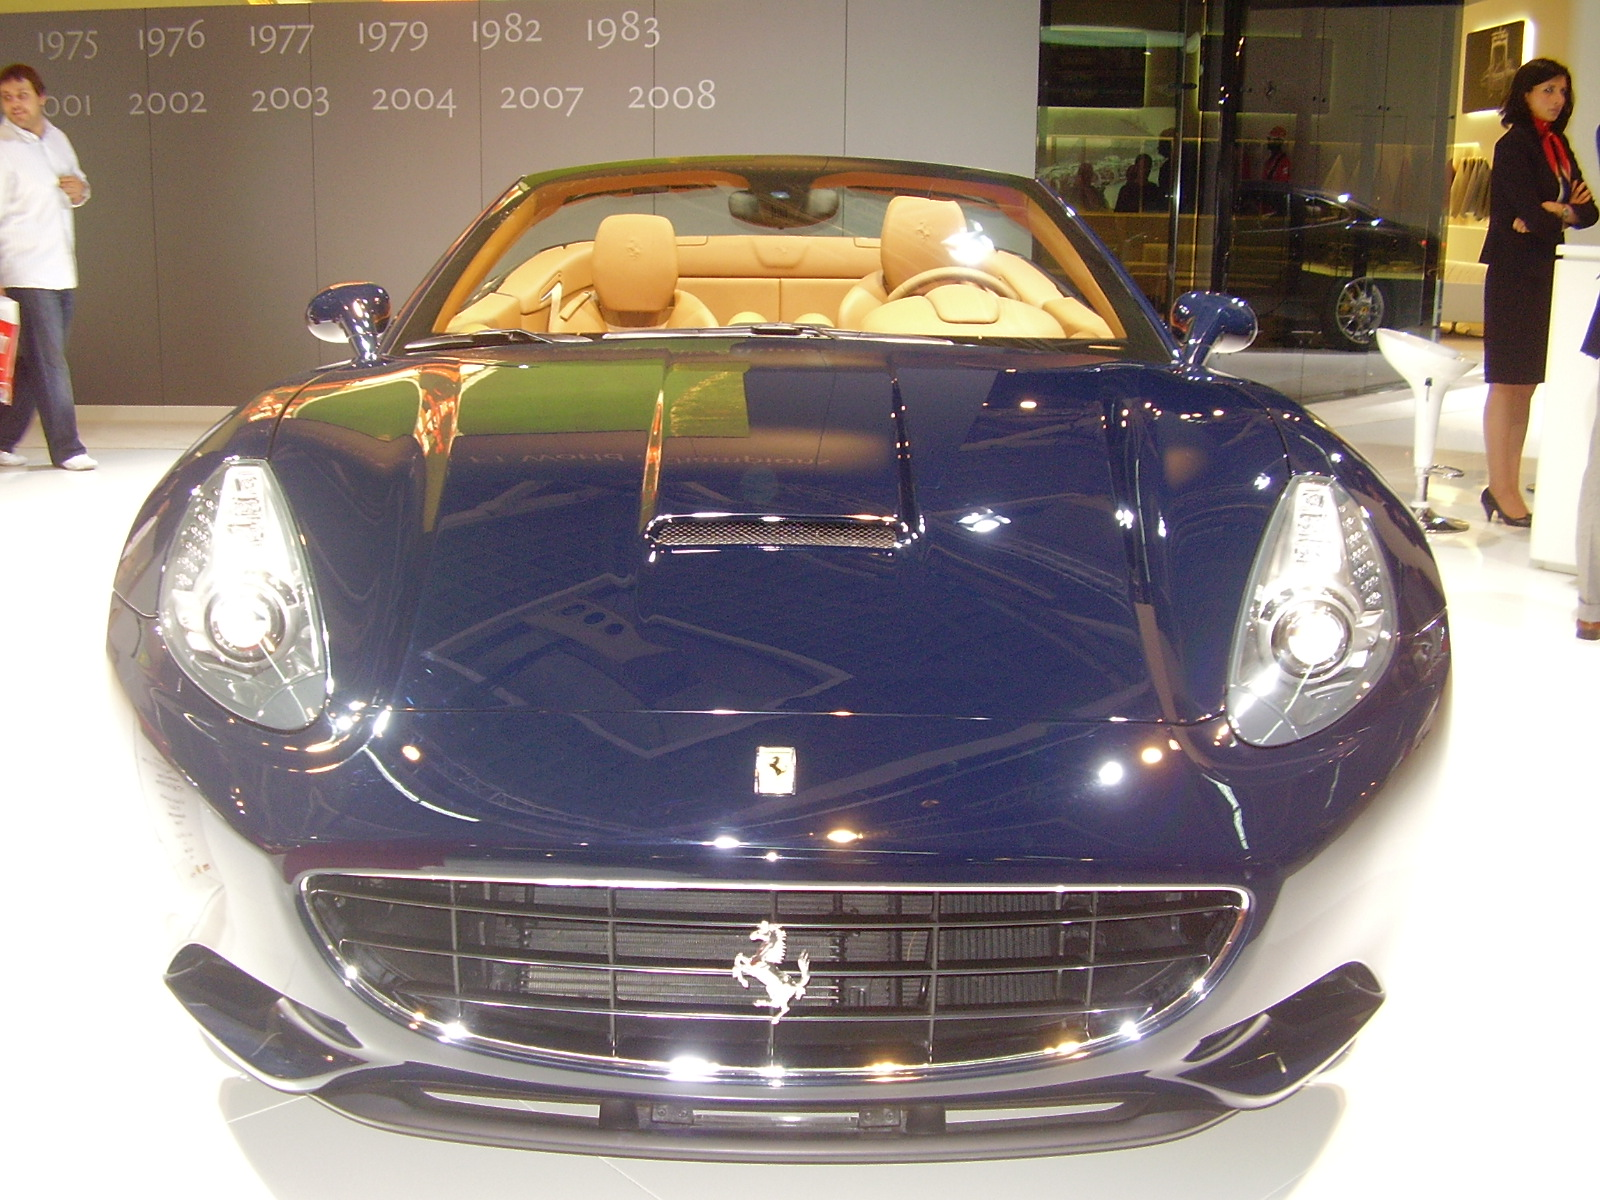 Visita Salon Automovil 09 BCN / Visit to Car Exhibition 09 Barcelona-P5140746.JPG